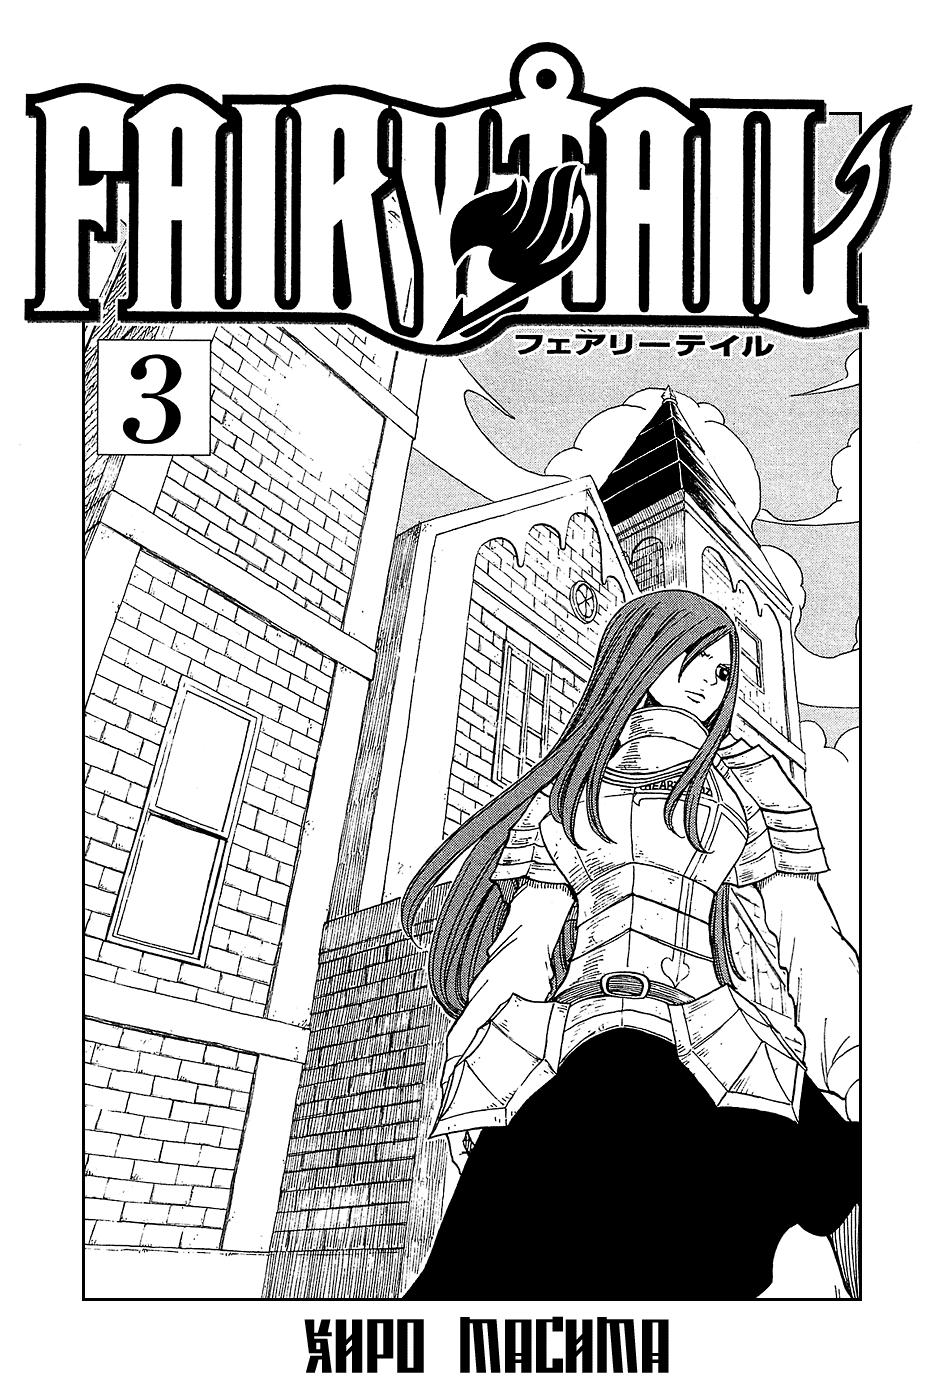 Манга Fairy Tail / Фейри Тейл / Хвост Феи Манга Fairy Tail Глава # 14 - Титатния, страница 1